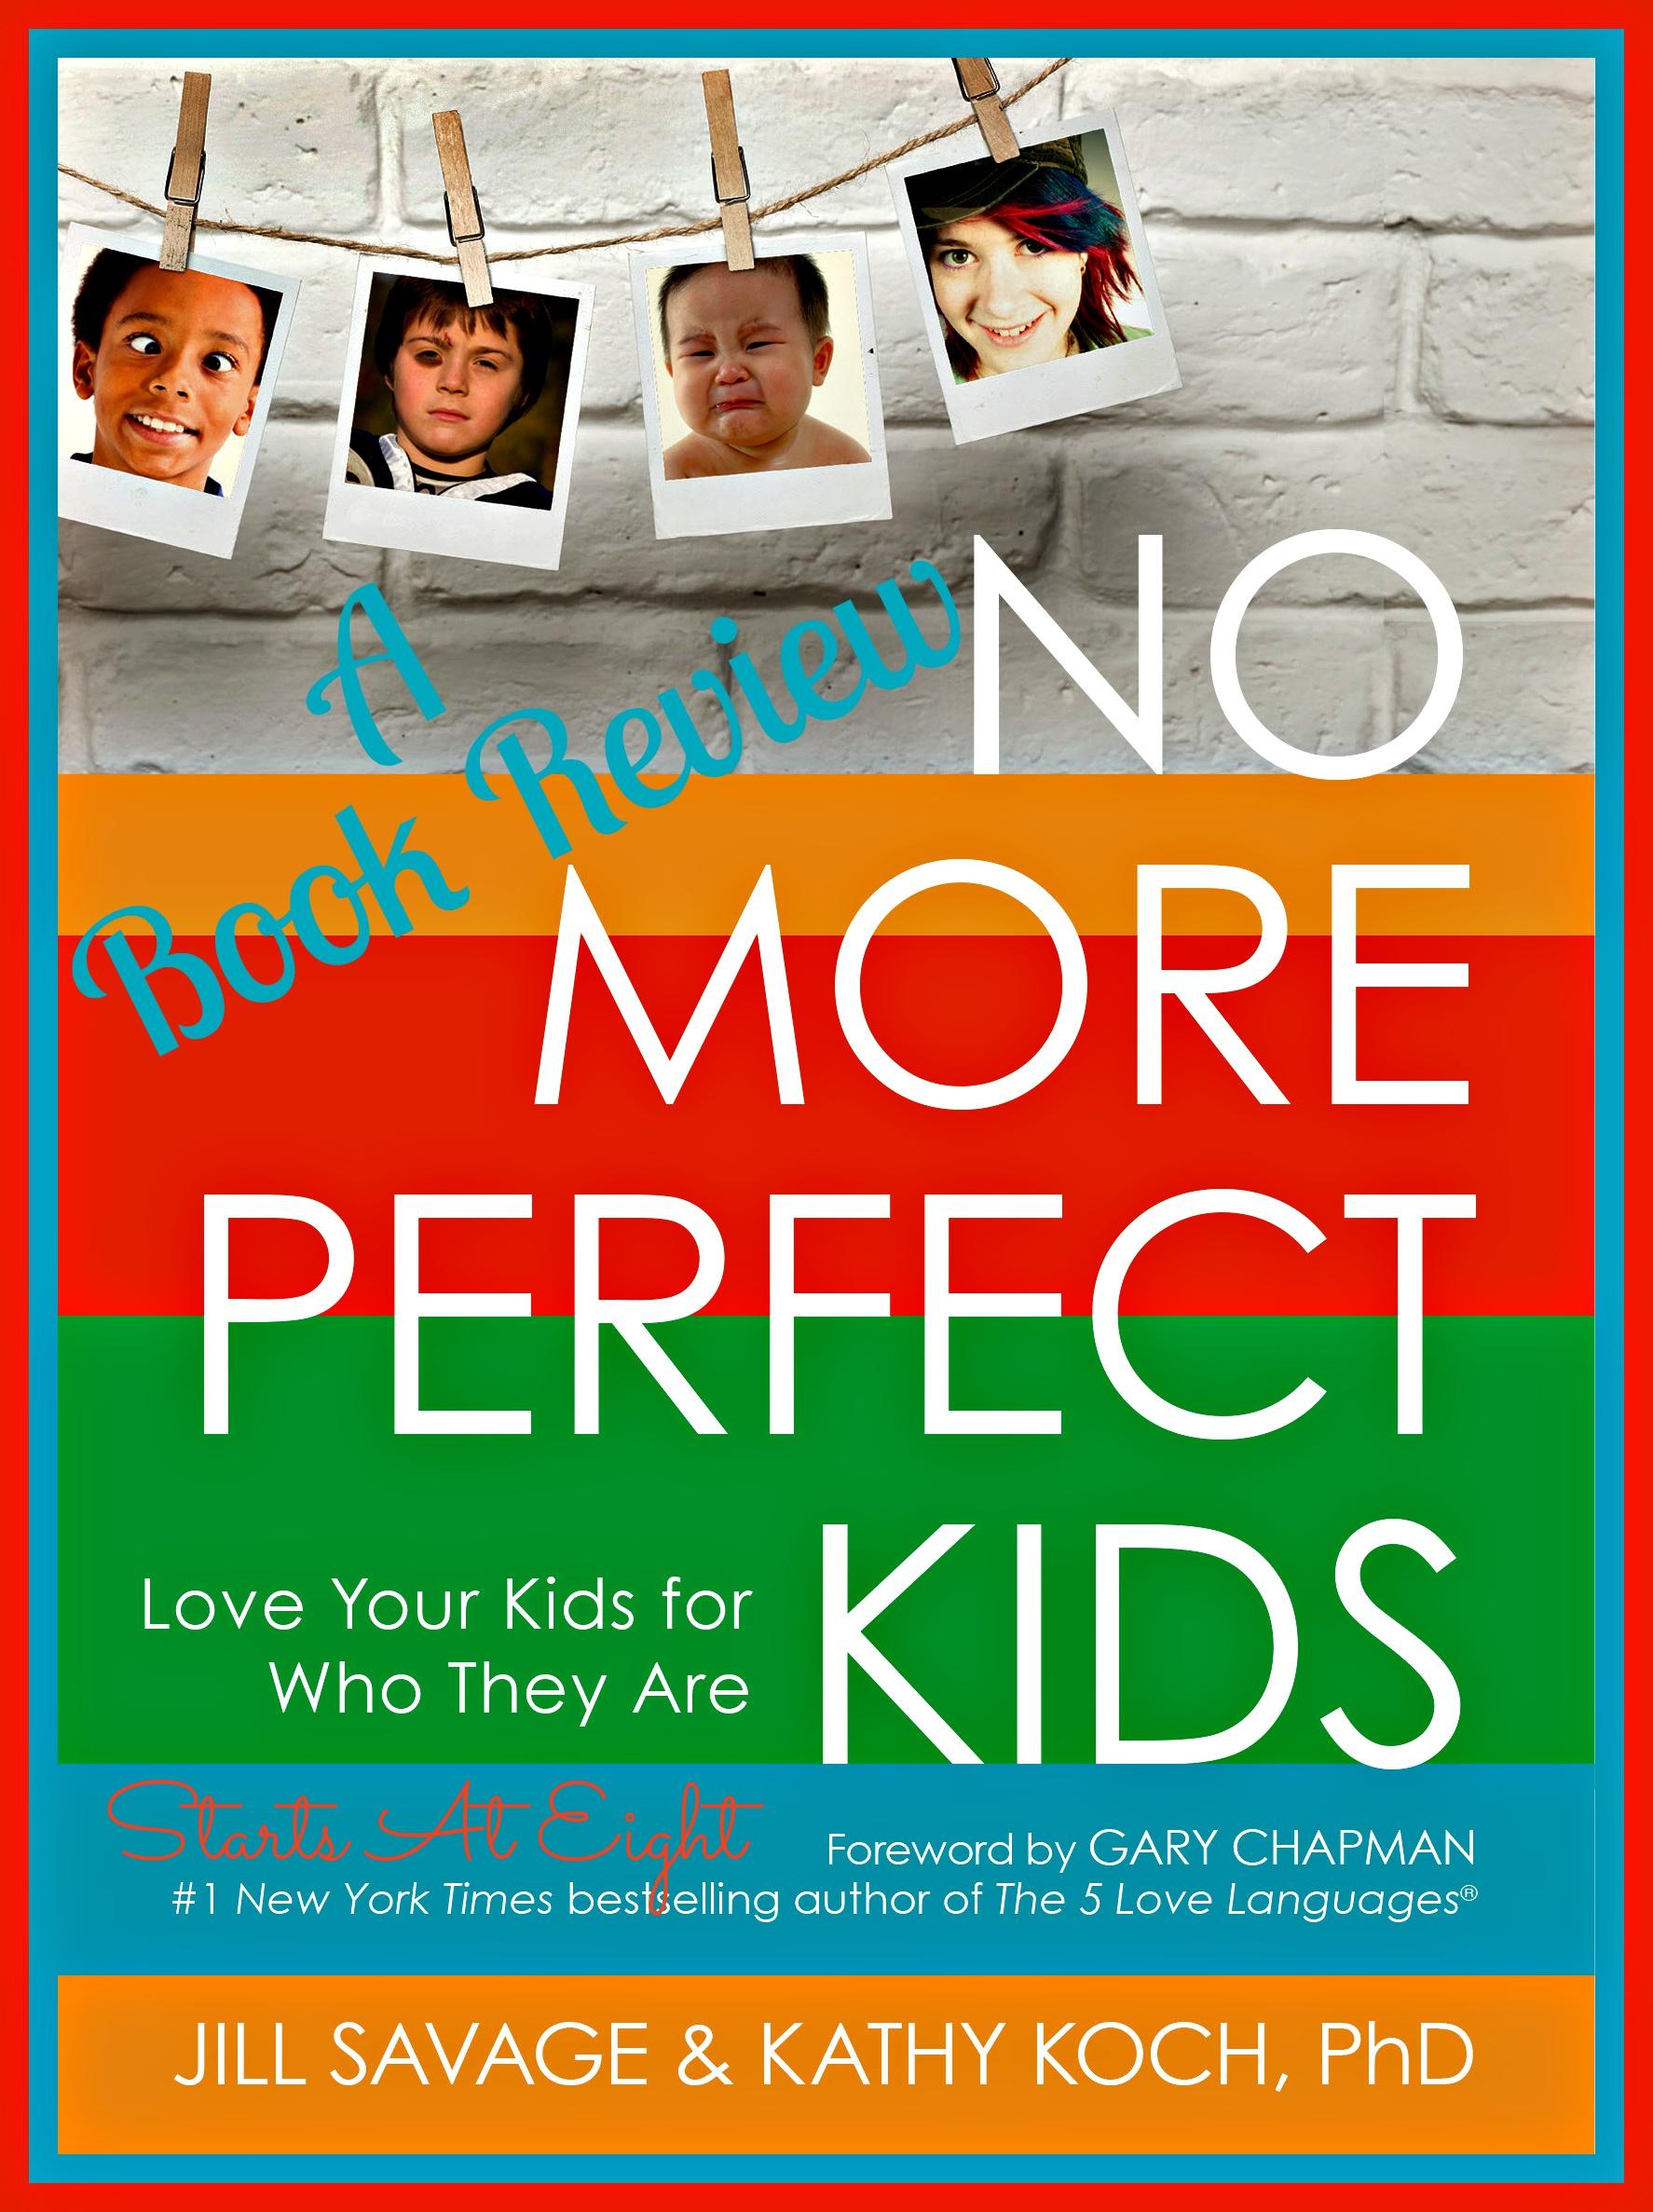 No More Perfect Kids!!